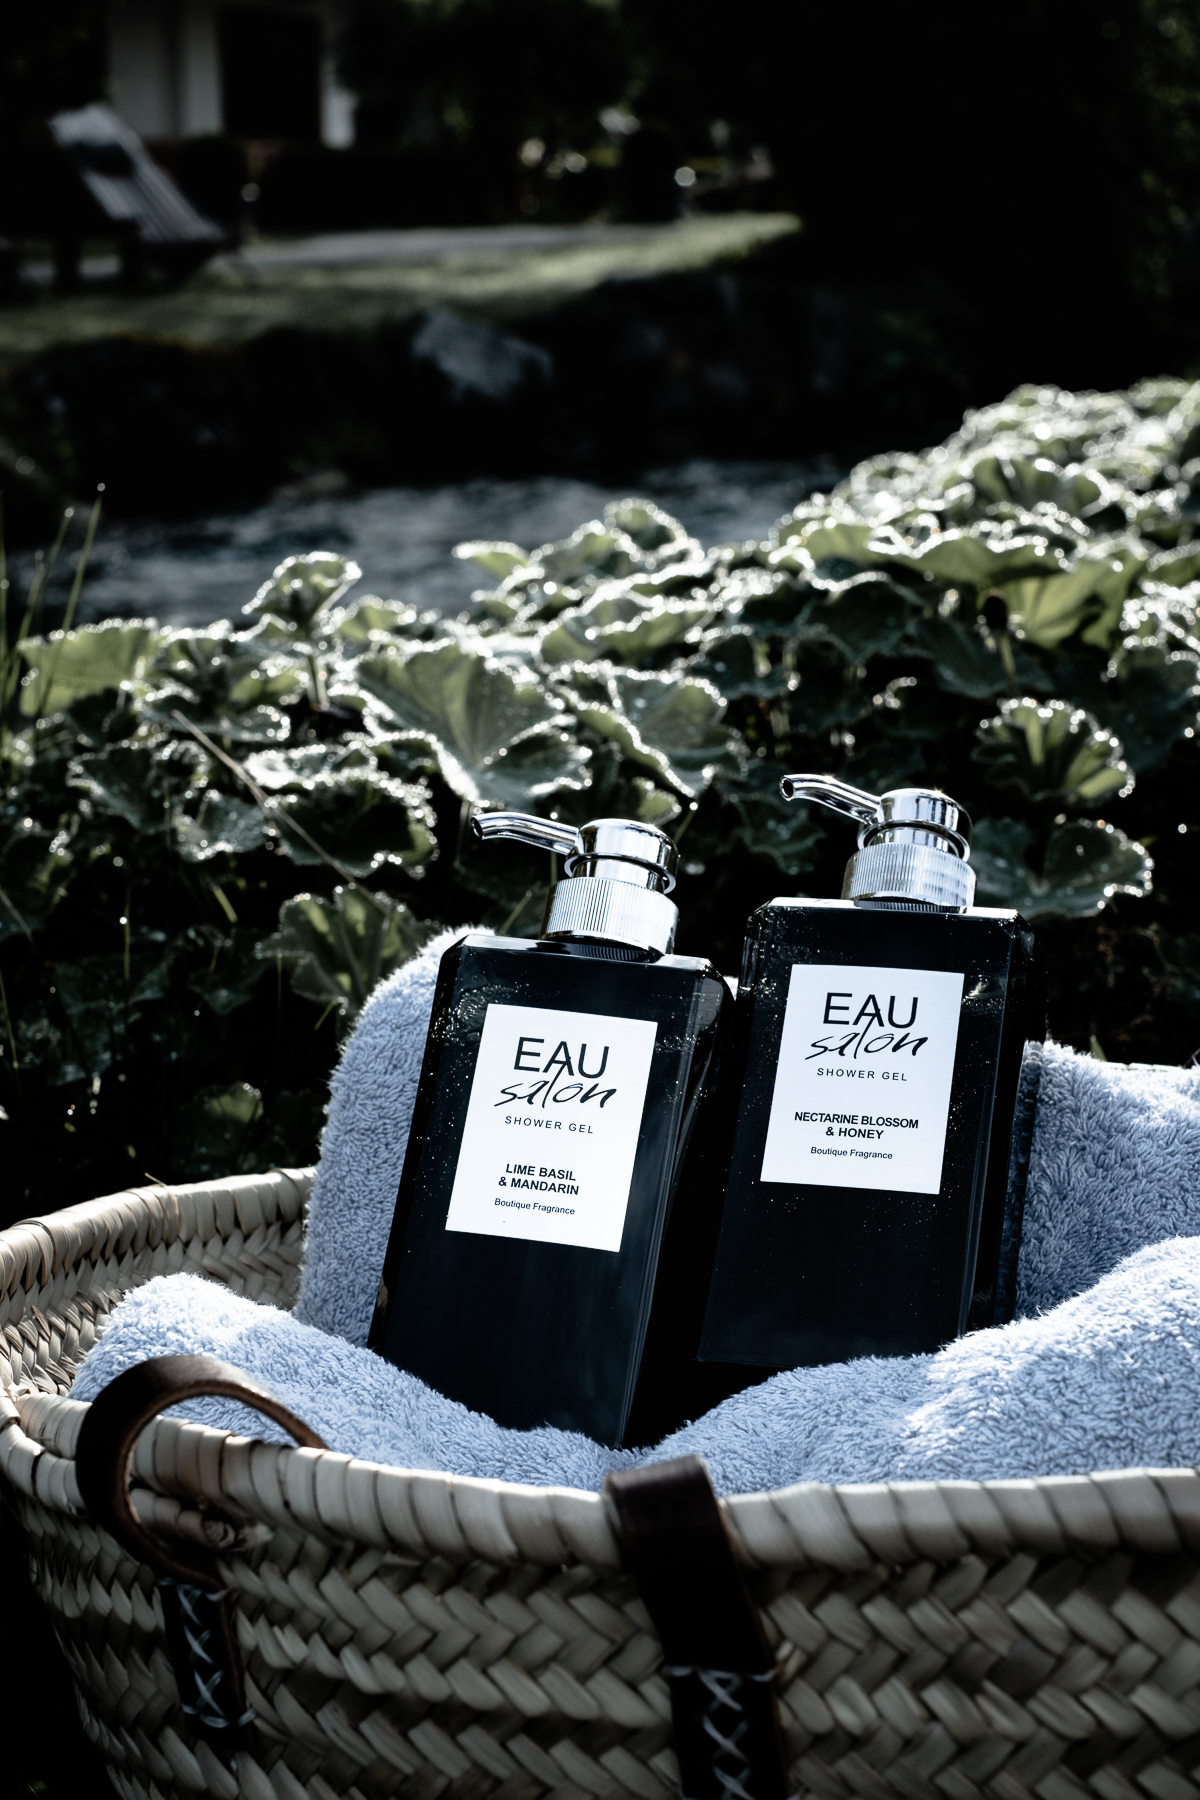 EAU Salon Shower Gel - FujiFilmXT3 - Yes! Please Enjoy-37.jpg